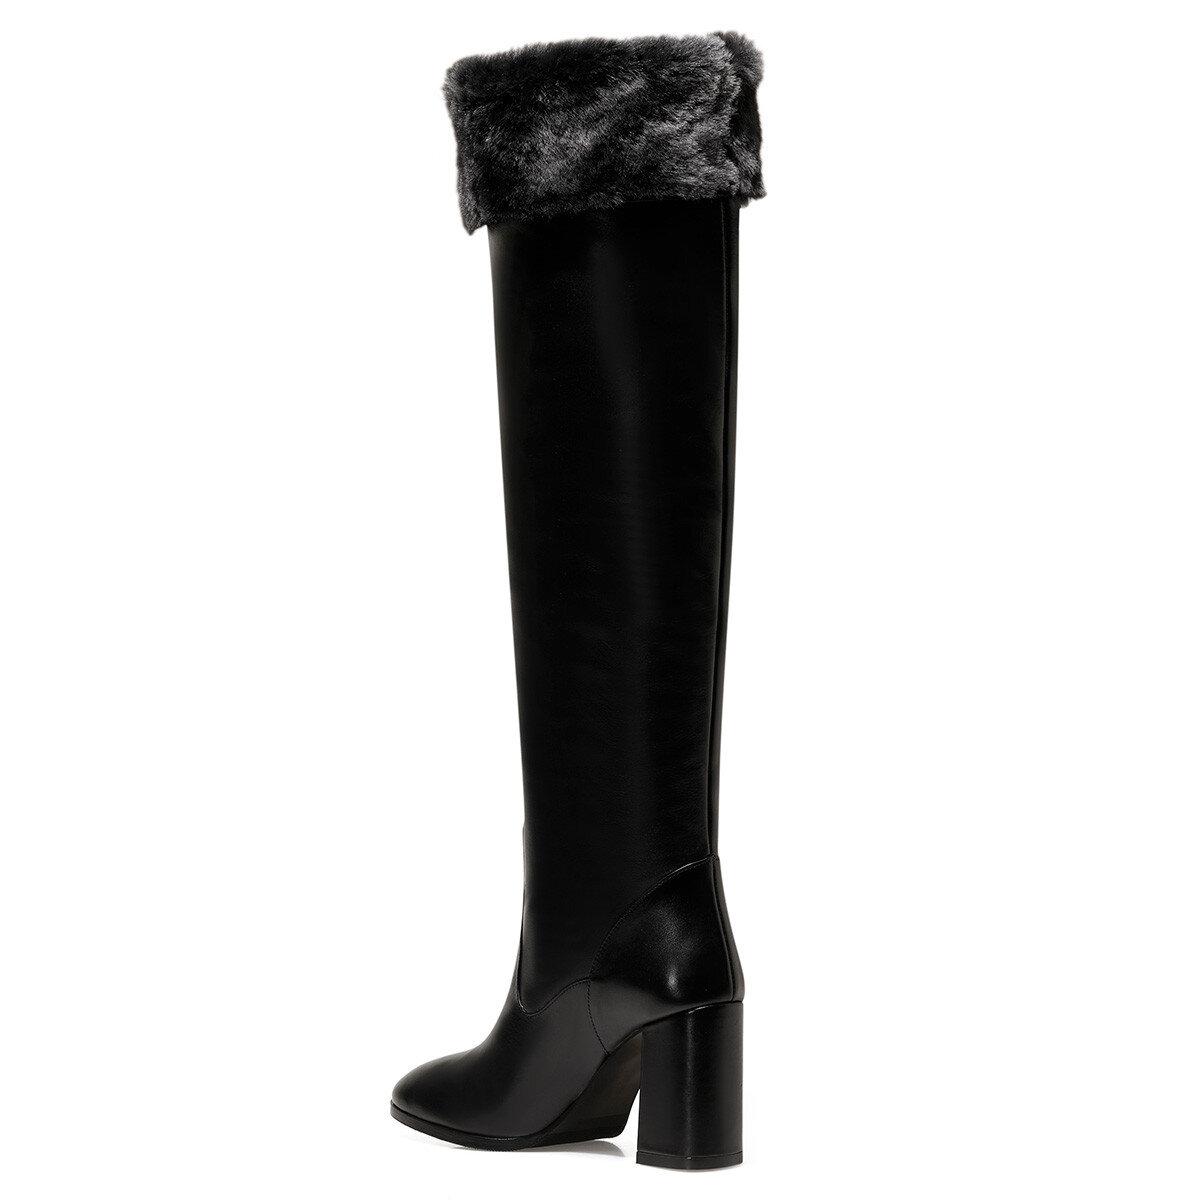 GRECO Siyah Kadın Topuklu Çizme